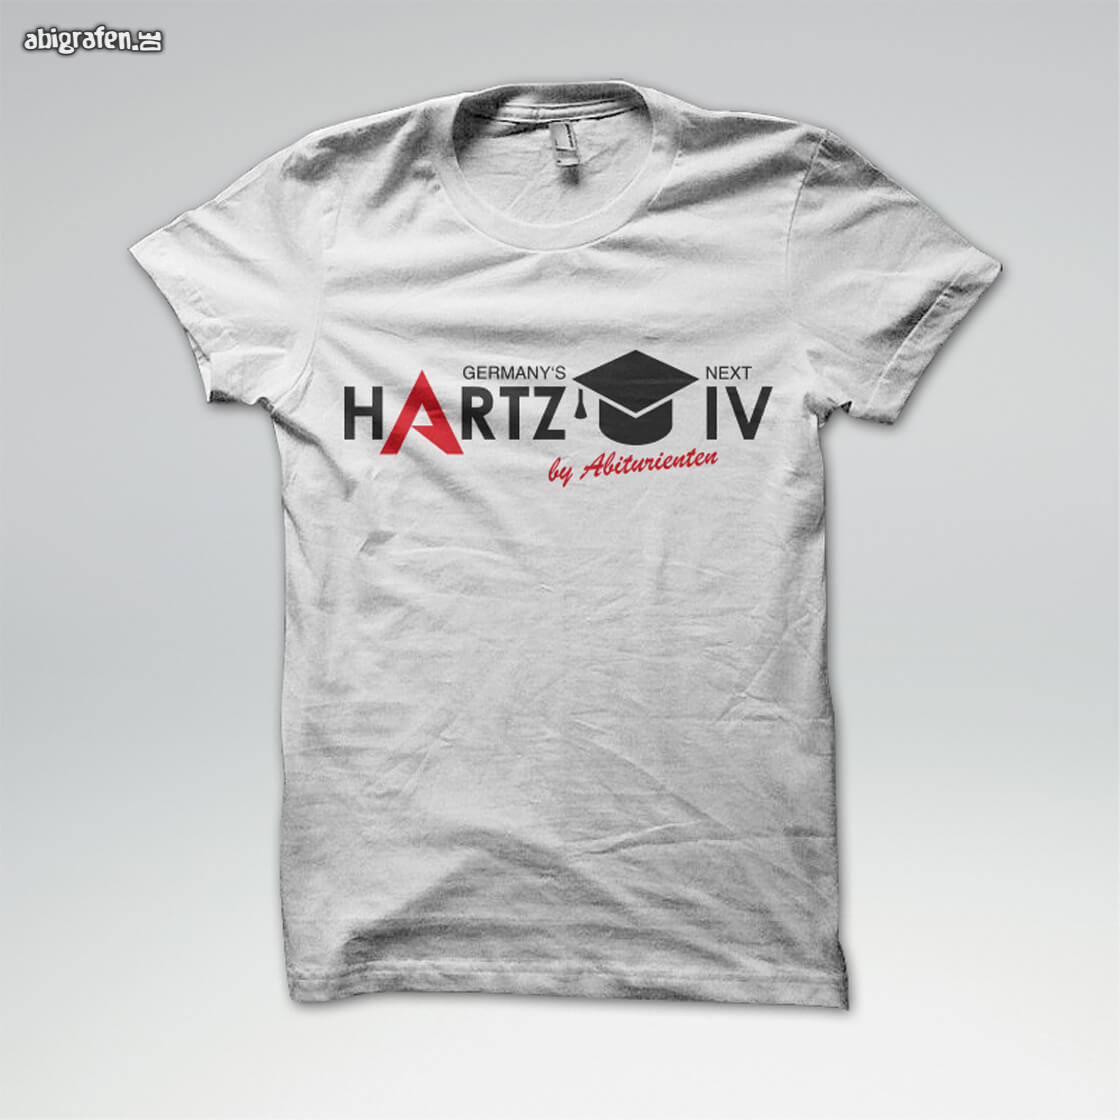 Abi Polo, Abi Hoodie, Abi Shirt, Abschlussshirt mit Abimotto Germany's Next Hartz IV – by Abiturienten